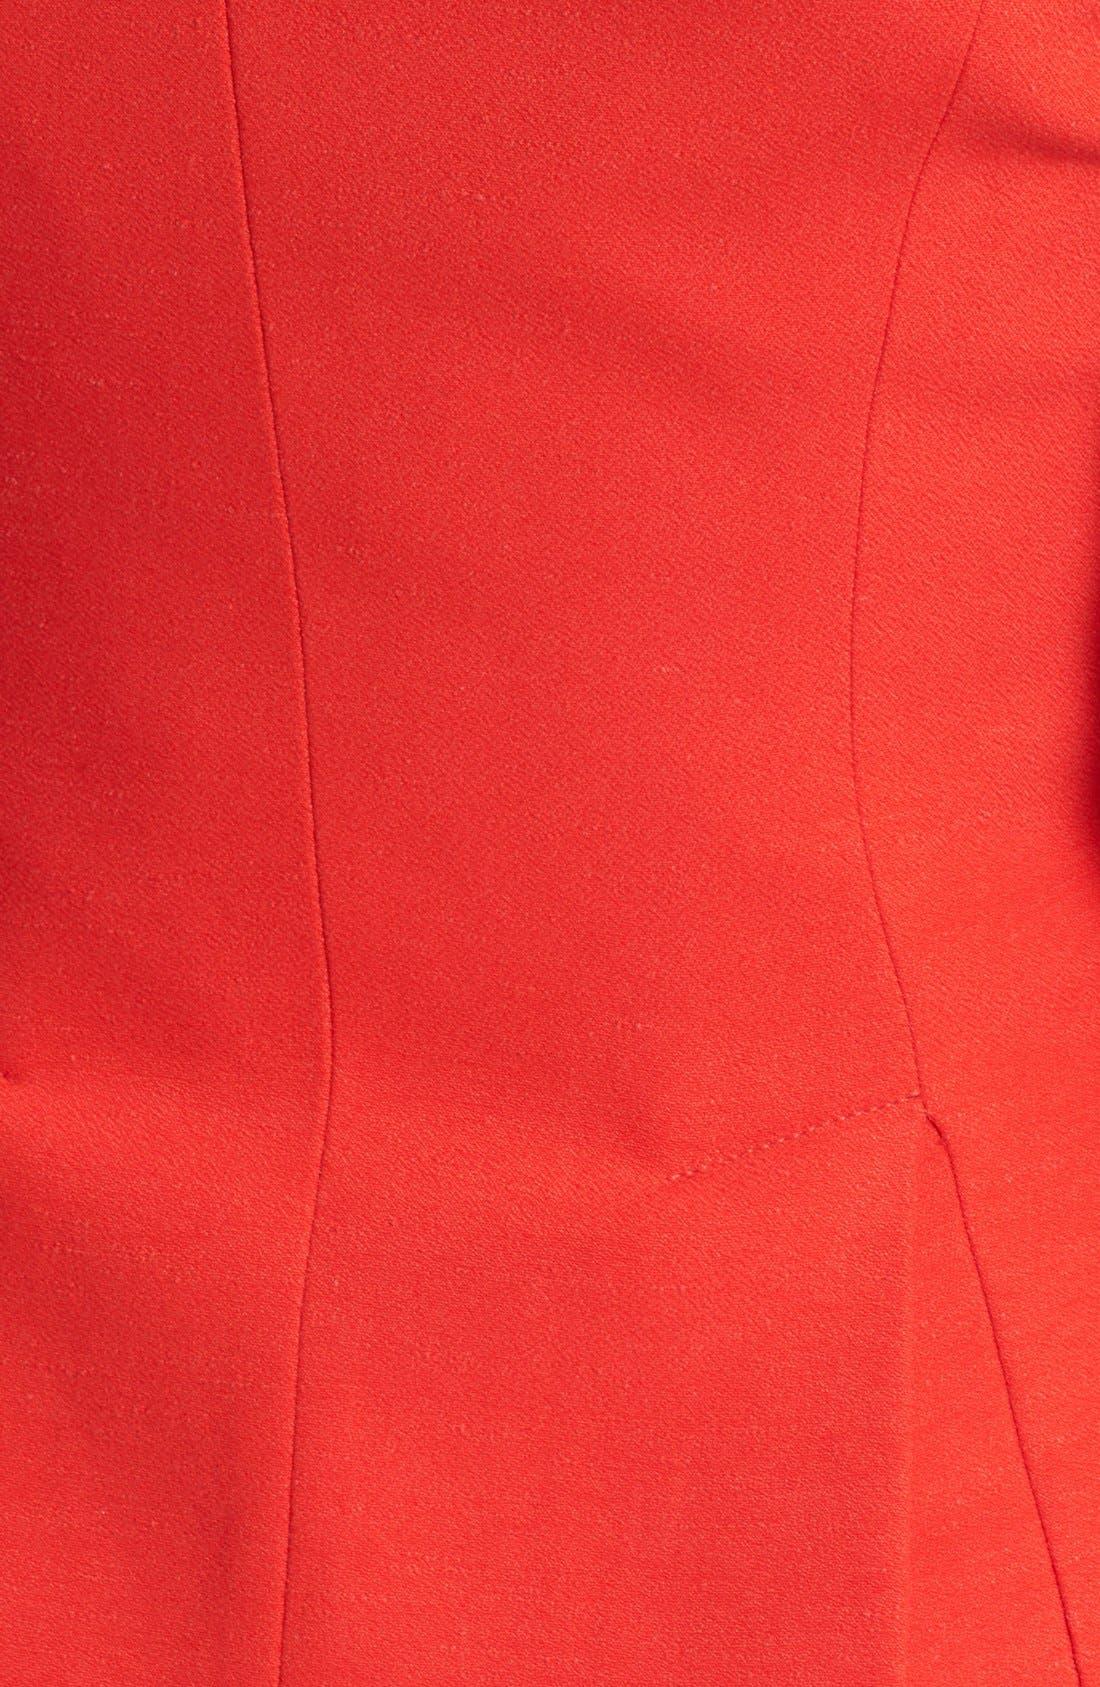 Alternate Image 3  - Altuzarra 'Fenice' Textured Blazer with Fraying Fringe